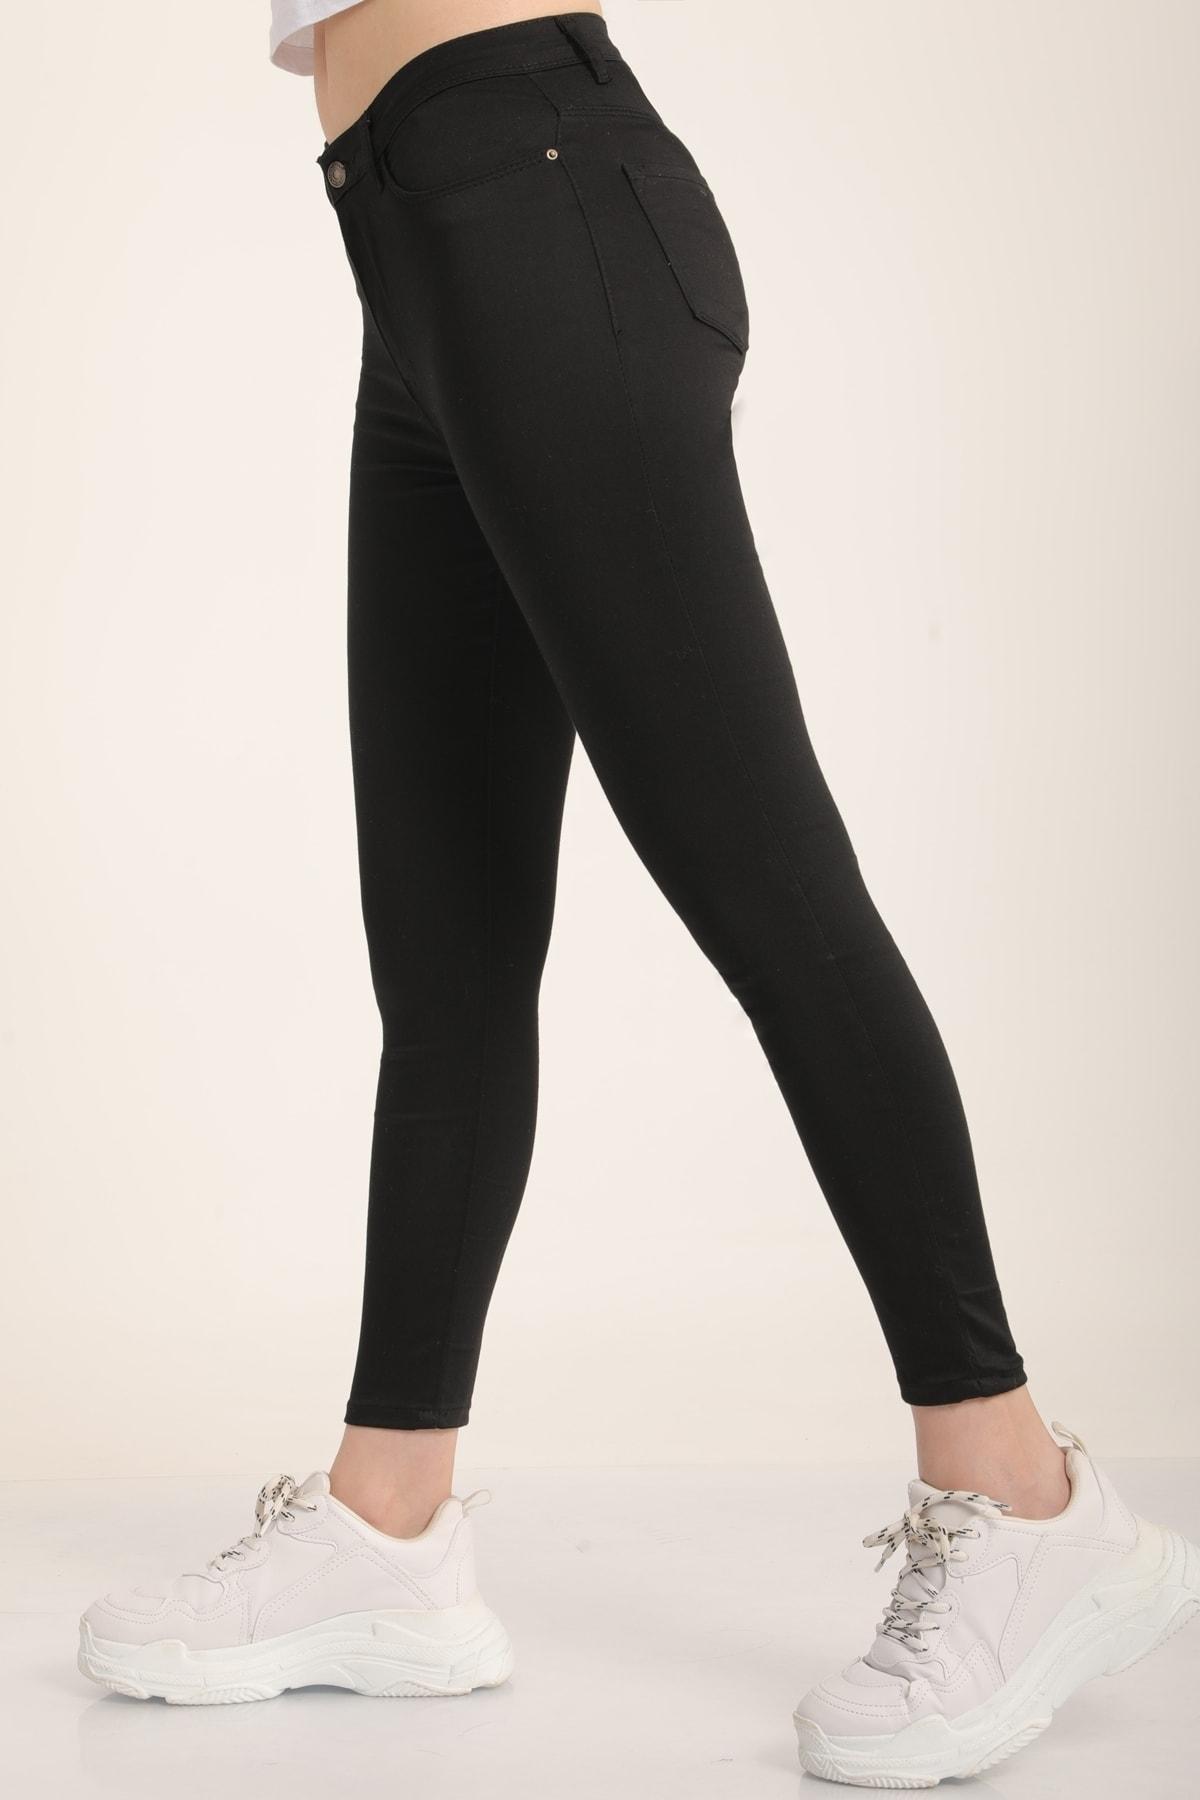 MD trend Kadın Siyah Yüksek Bel Skinny Jean Pantolon Mdt4542 1